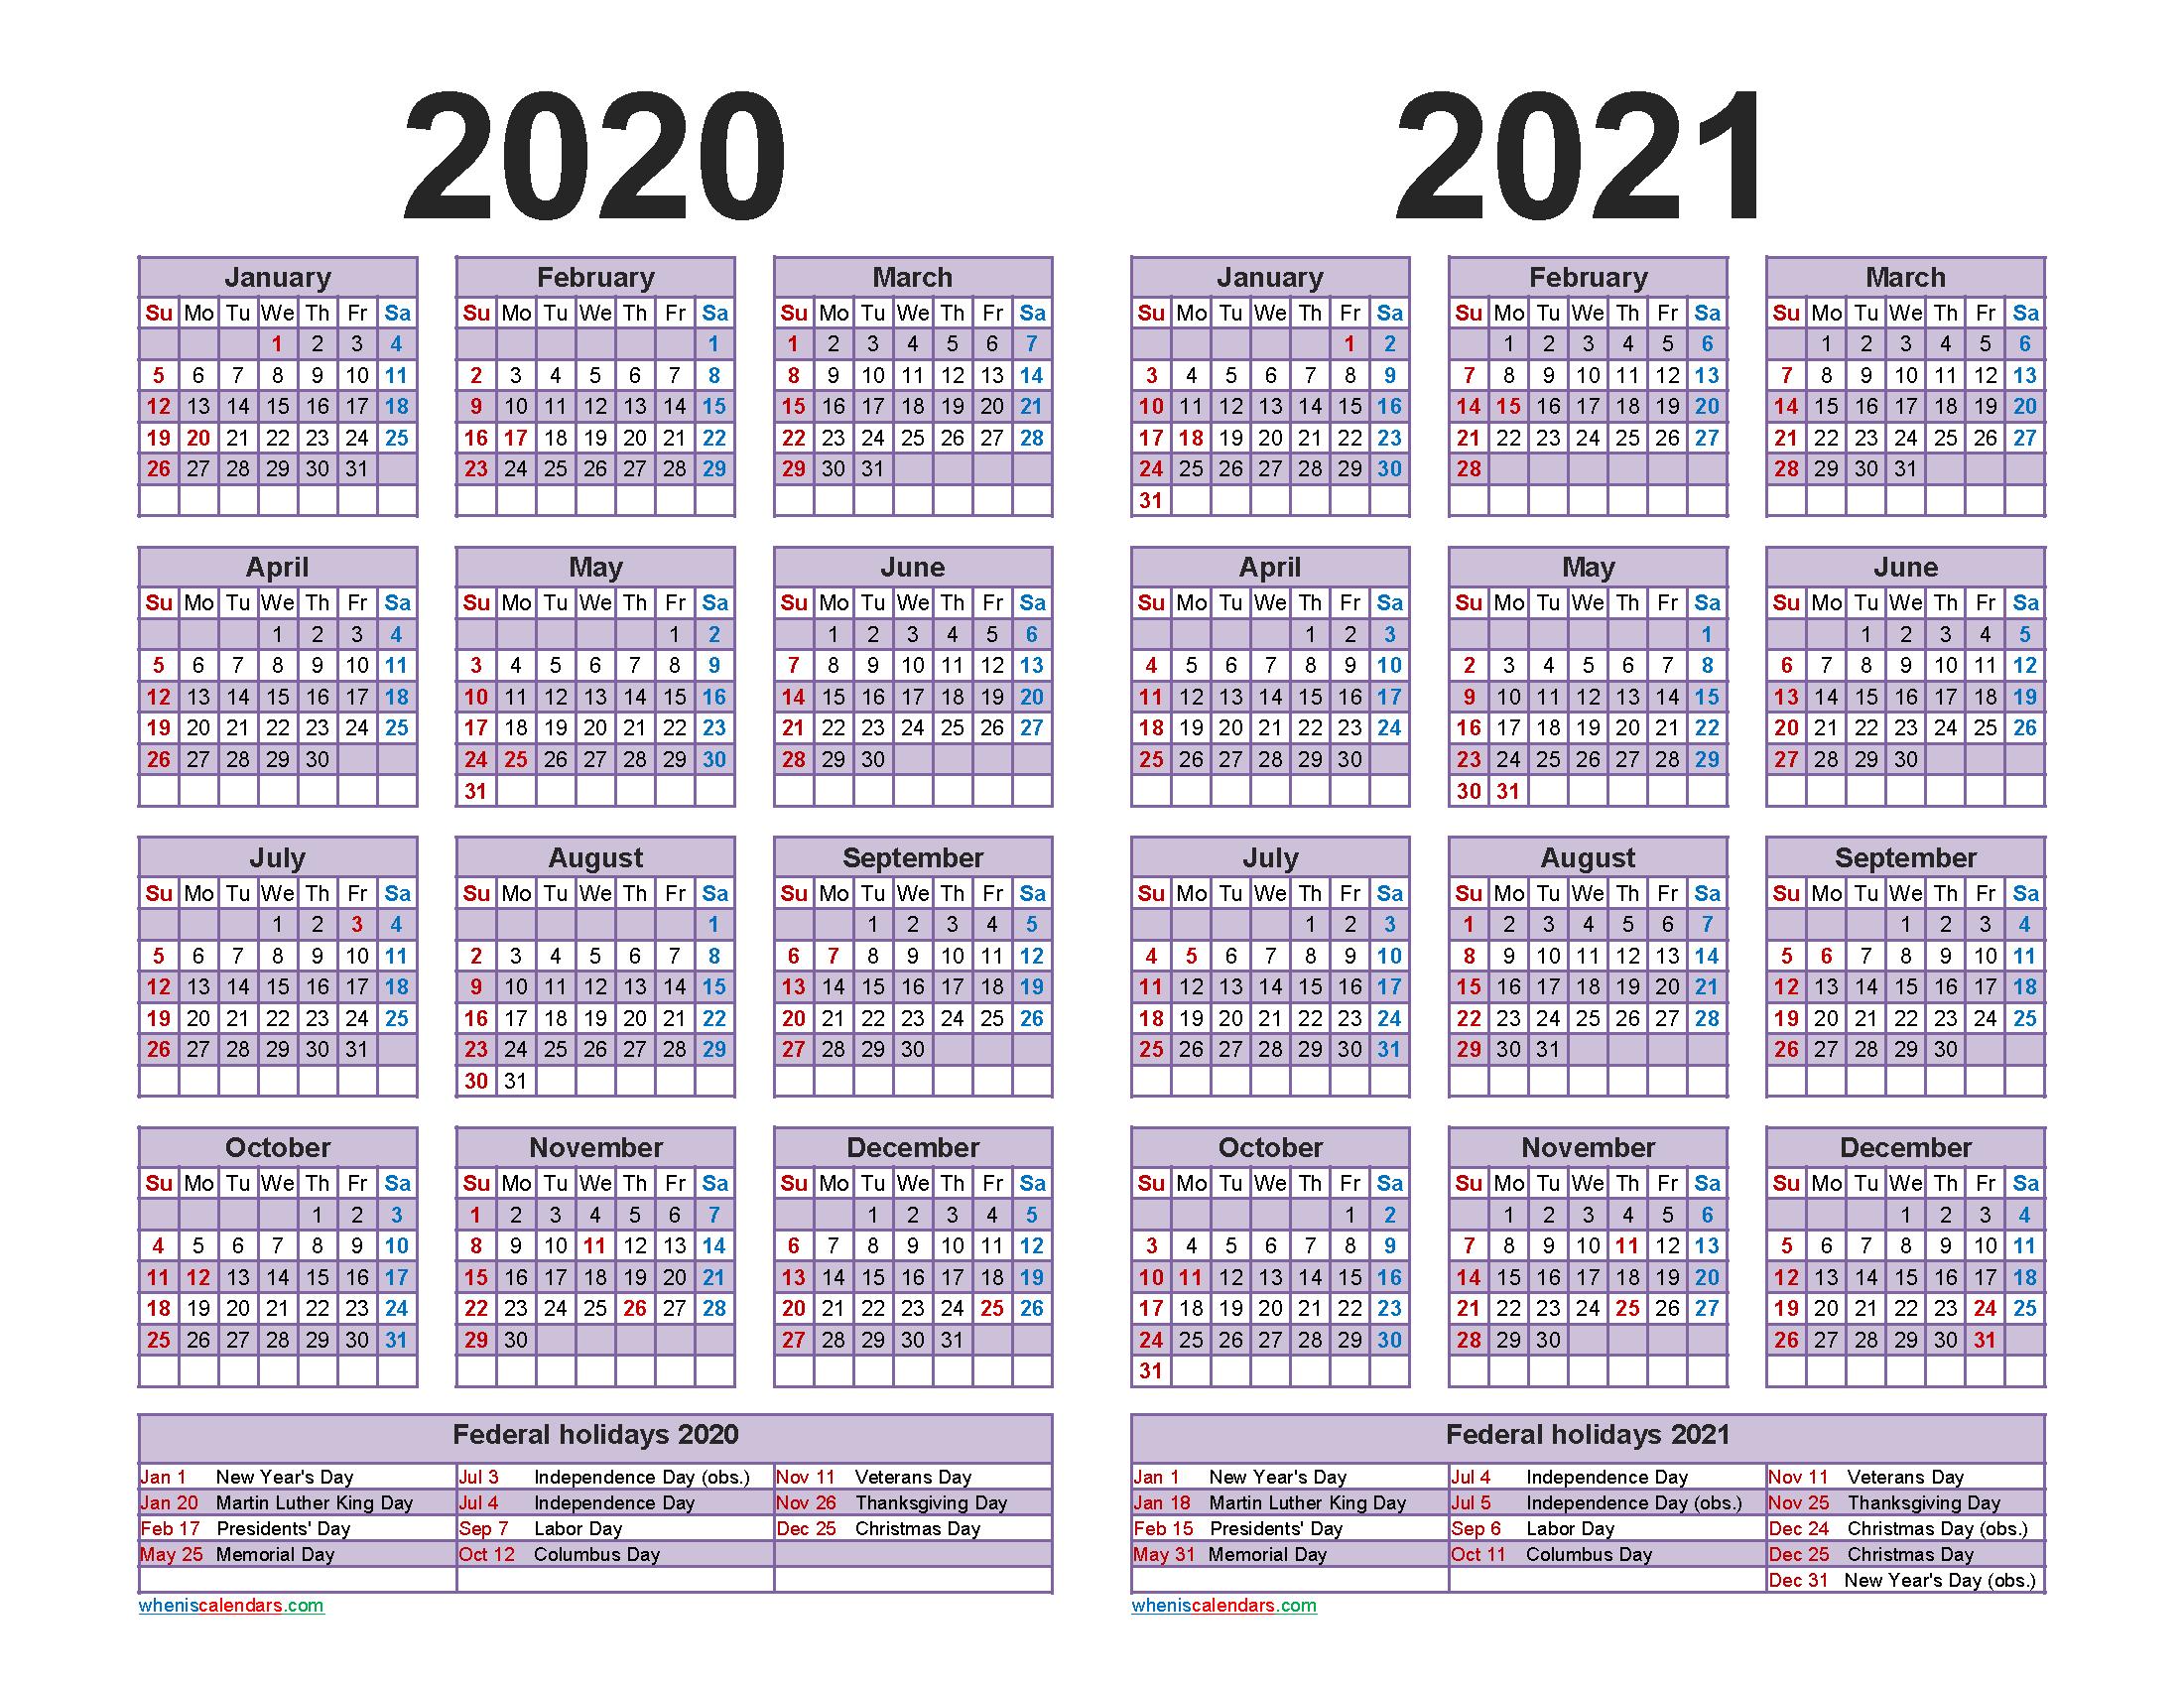 Free 2020 and 2021 Calendar Printable Word, PDF | Free ...